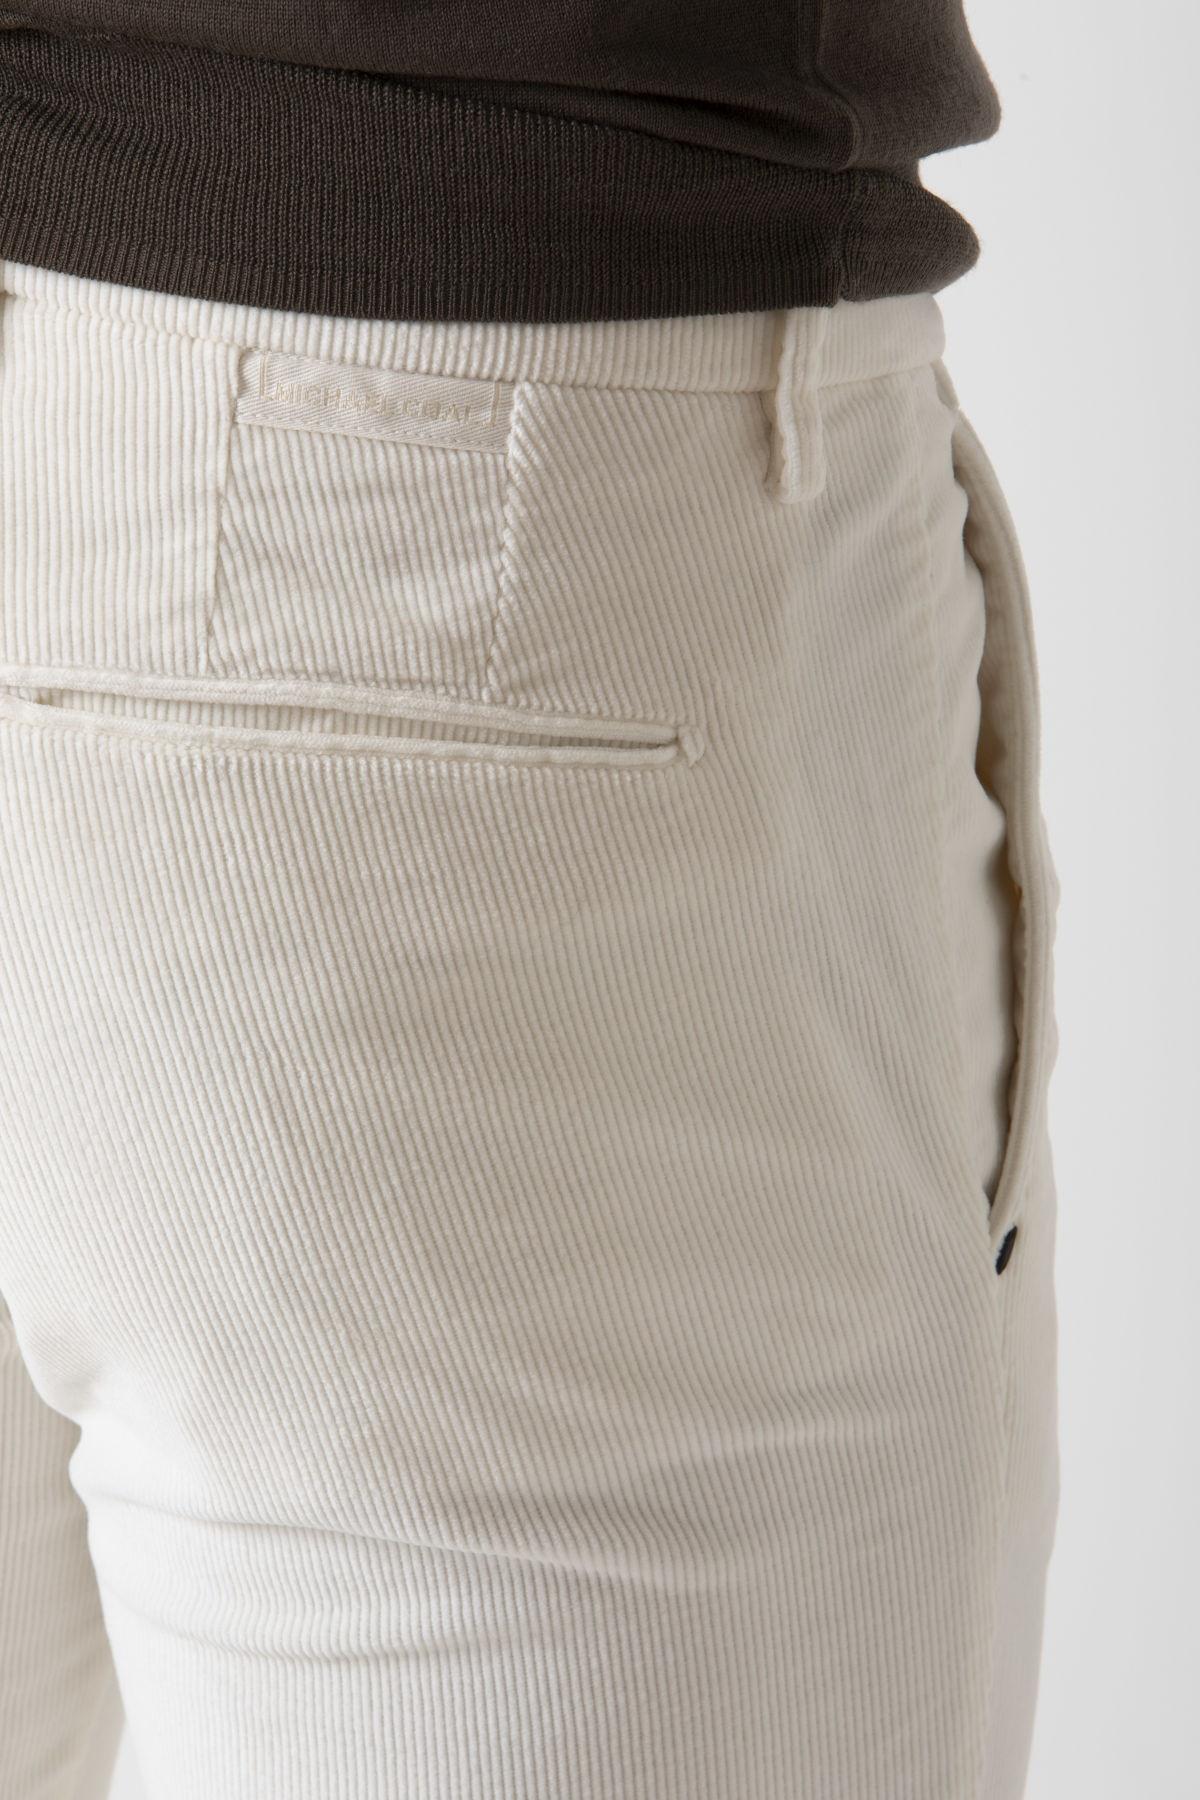 Pantaloni BRAD per uomo MICHAEL COAL A/I 19-20